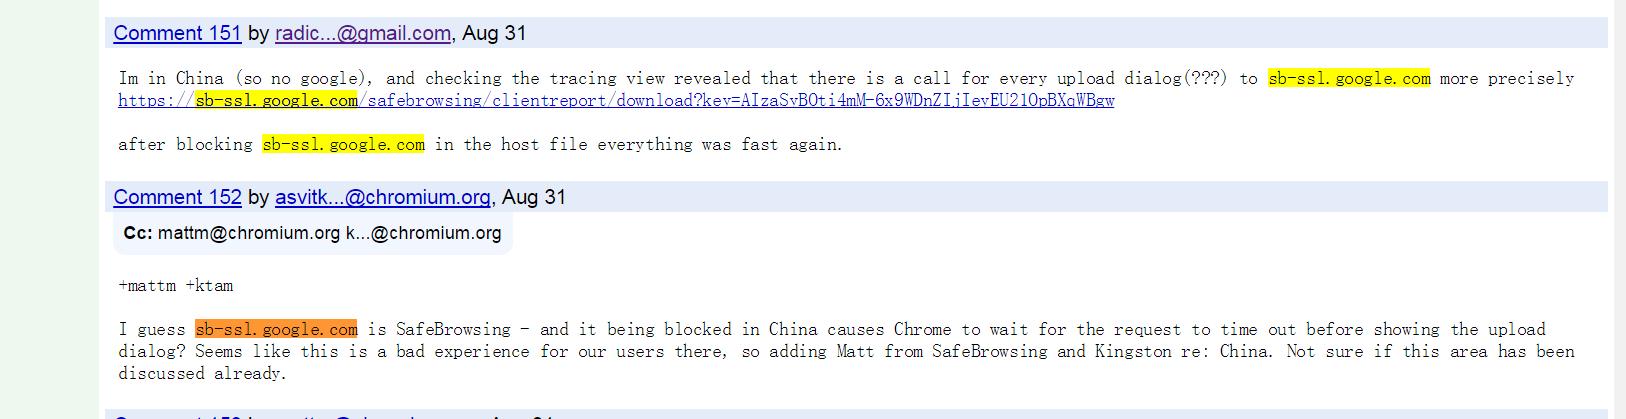 chrome 上传文件控件,选择文件时会延迟近10s